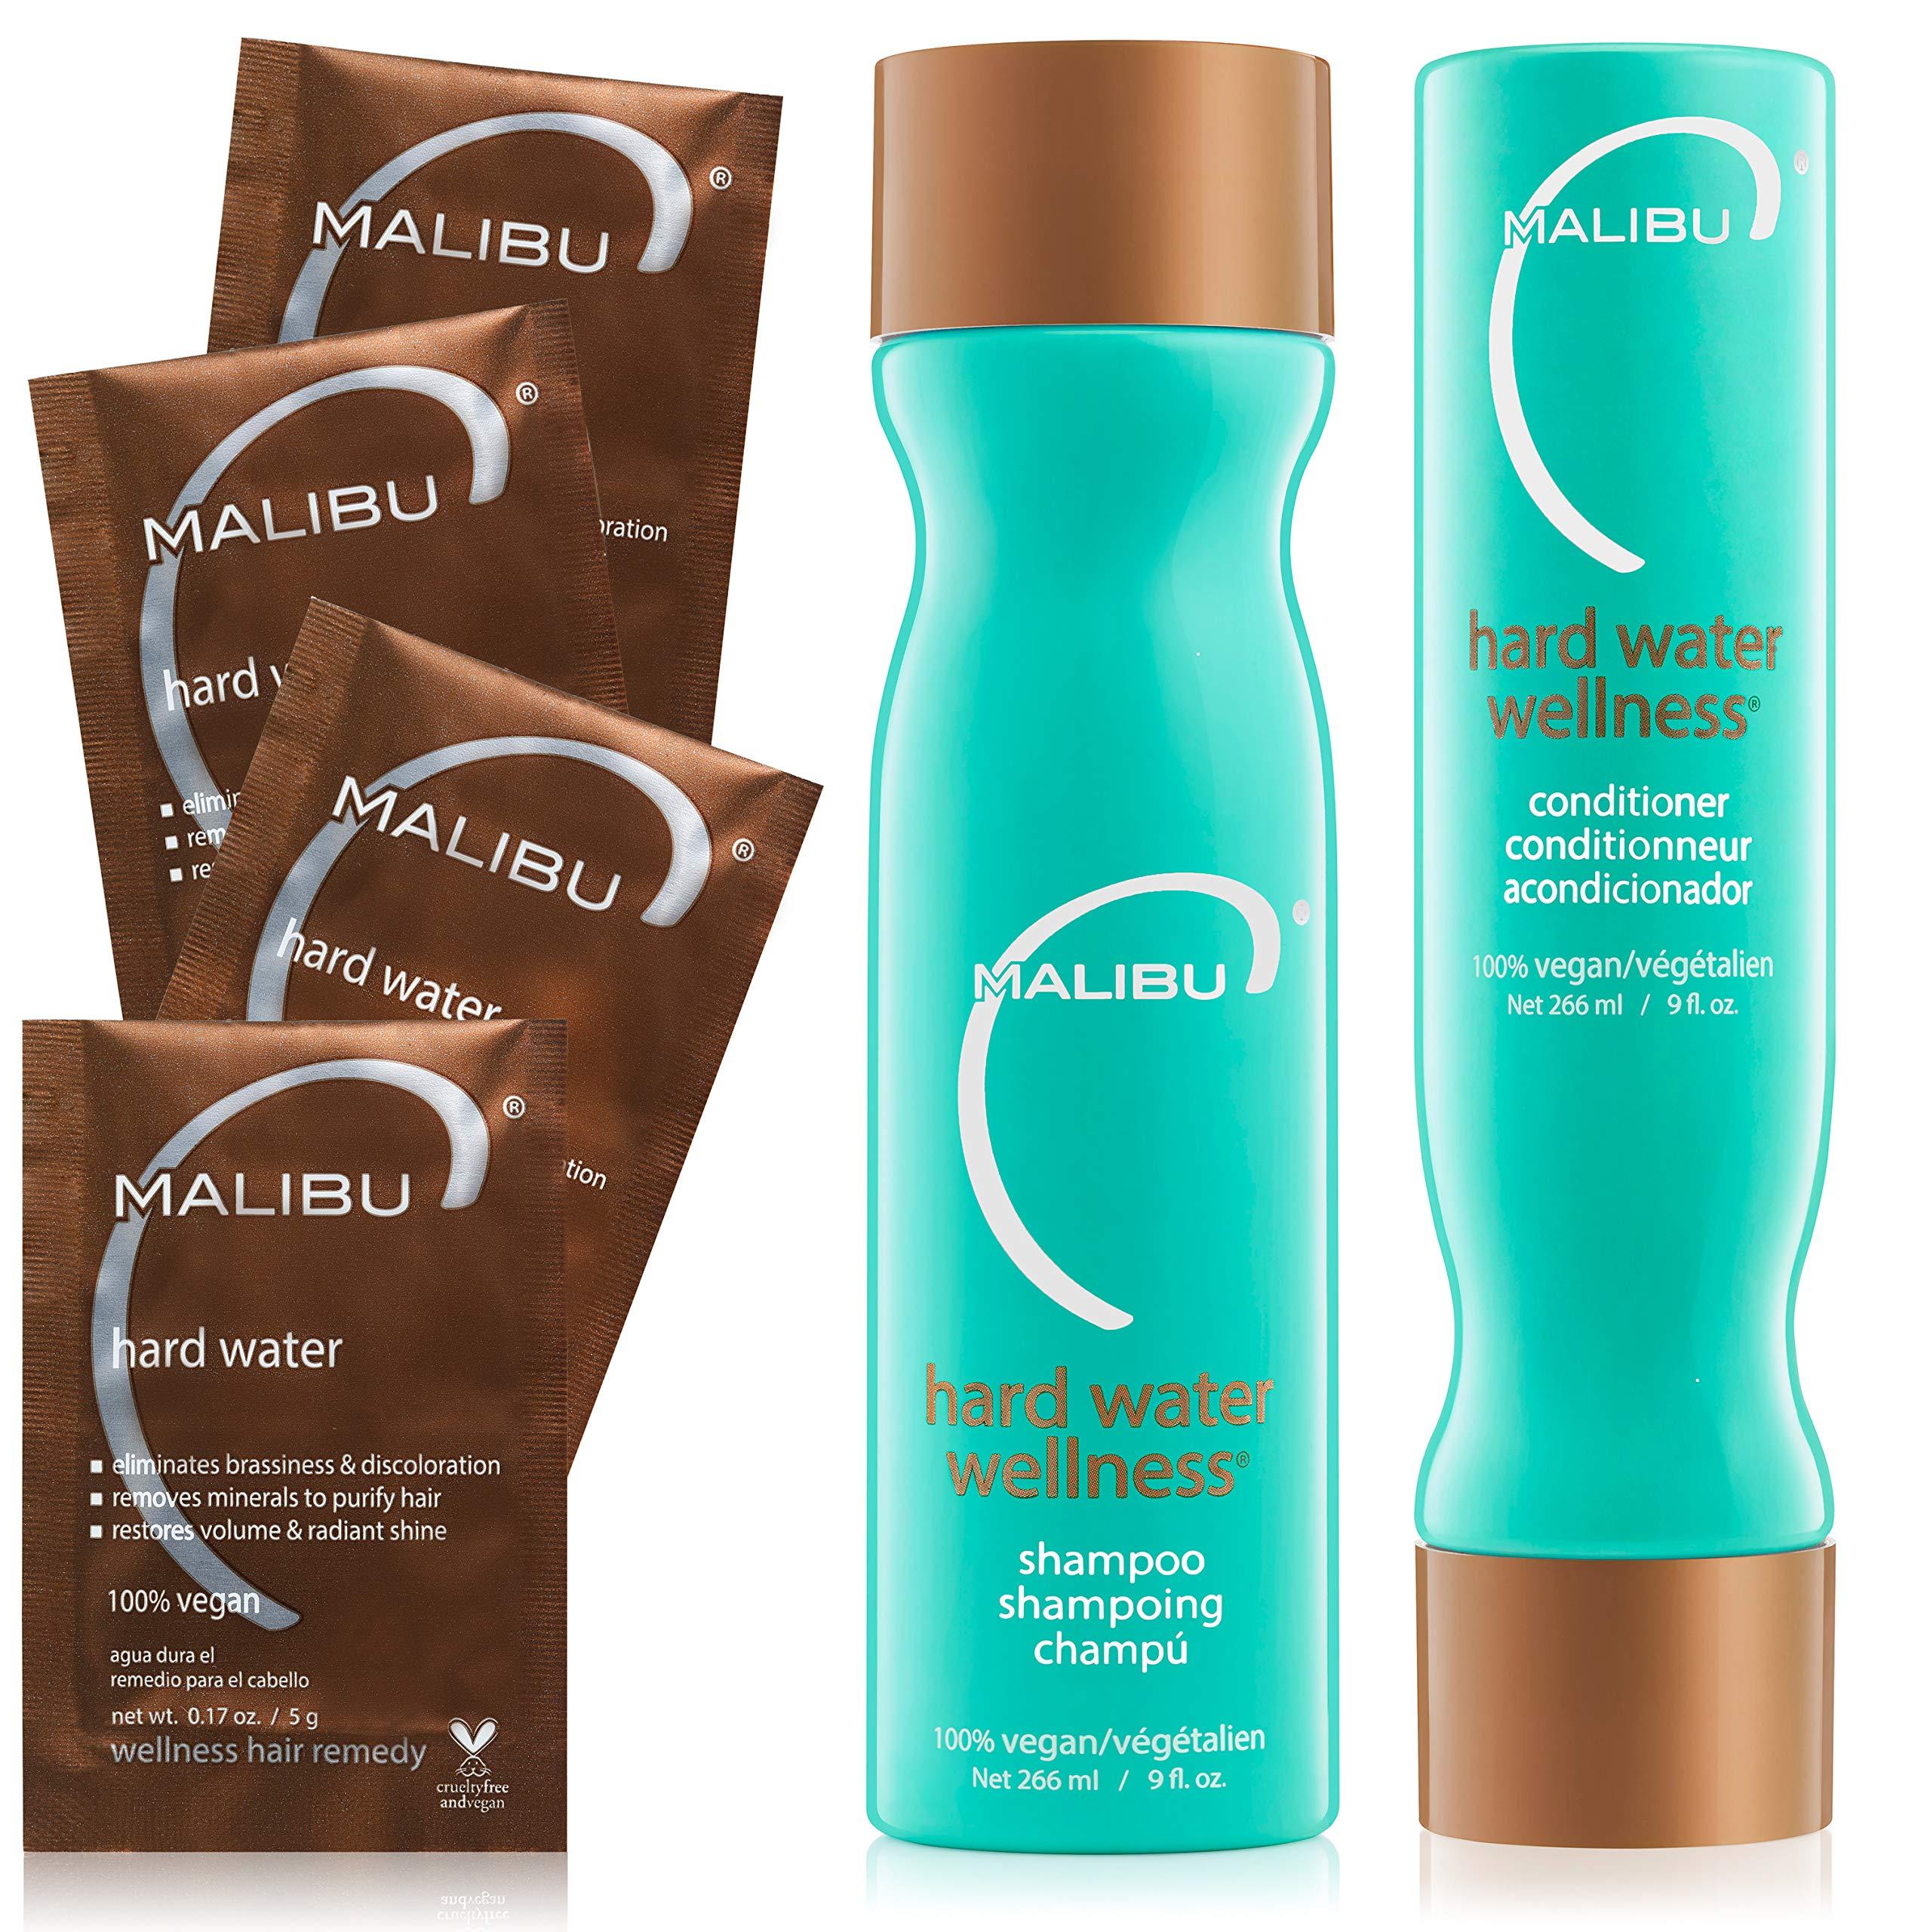 Malibu C Hard Water Wellness Collection by Malibu C